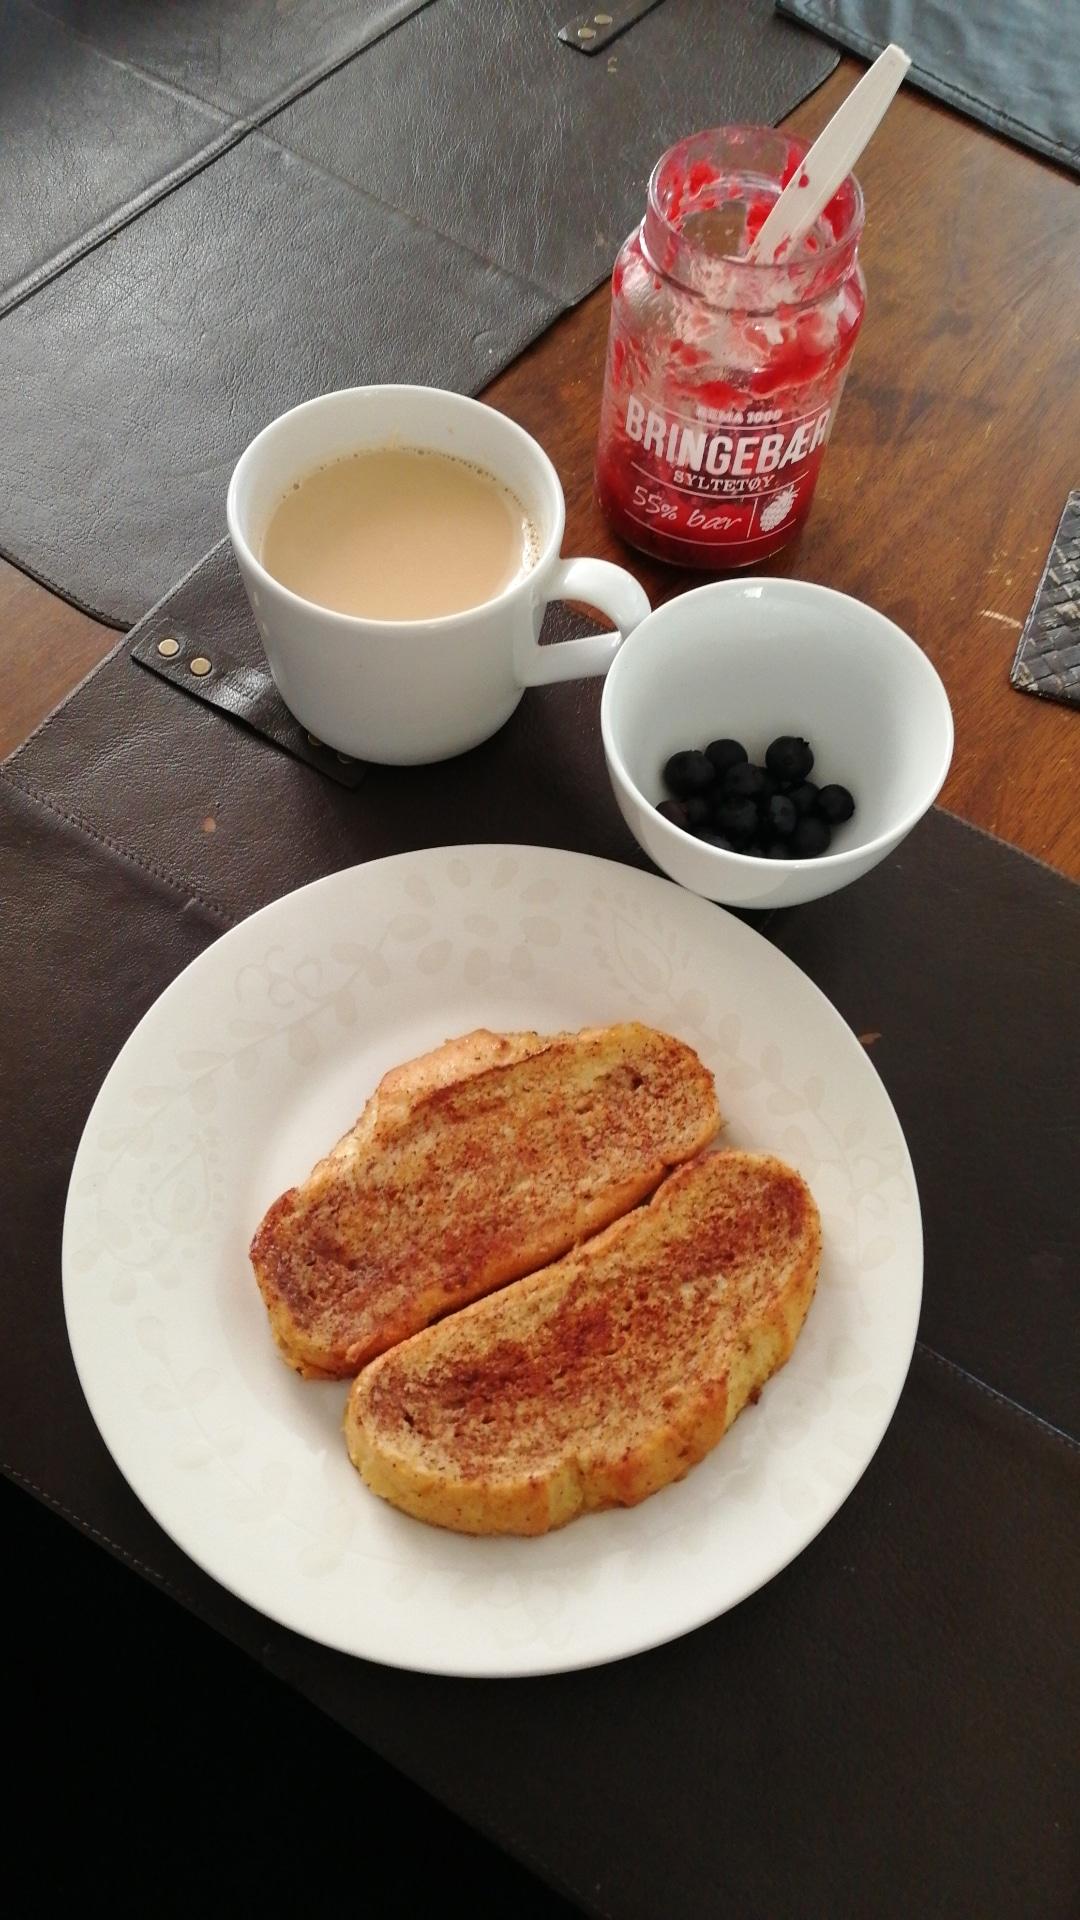 armeriddere-mat-frokost-blåbær-bær-kaffe-cafelatte-caffelatte-kaffelatte-isalicious-blogger-blogg-blog